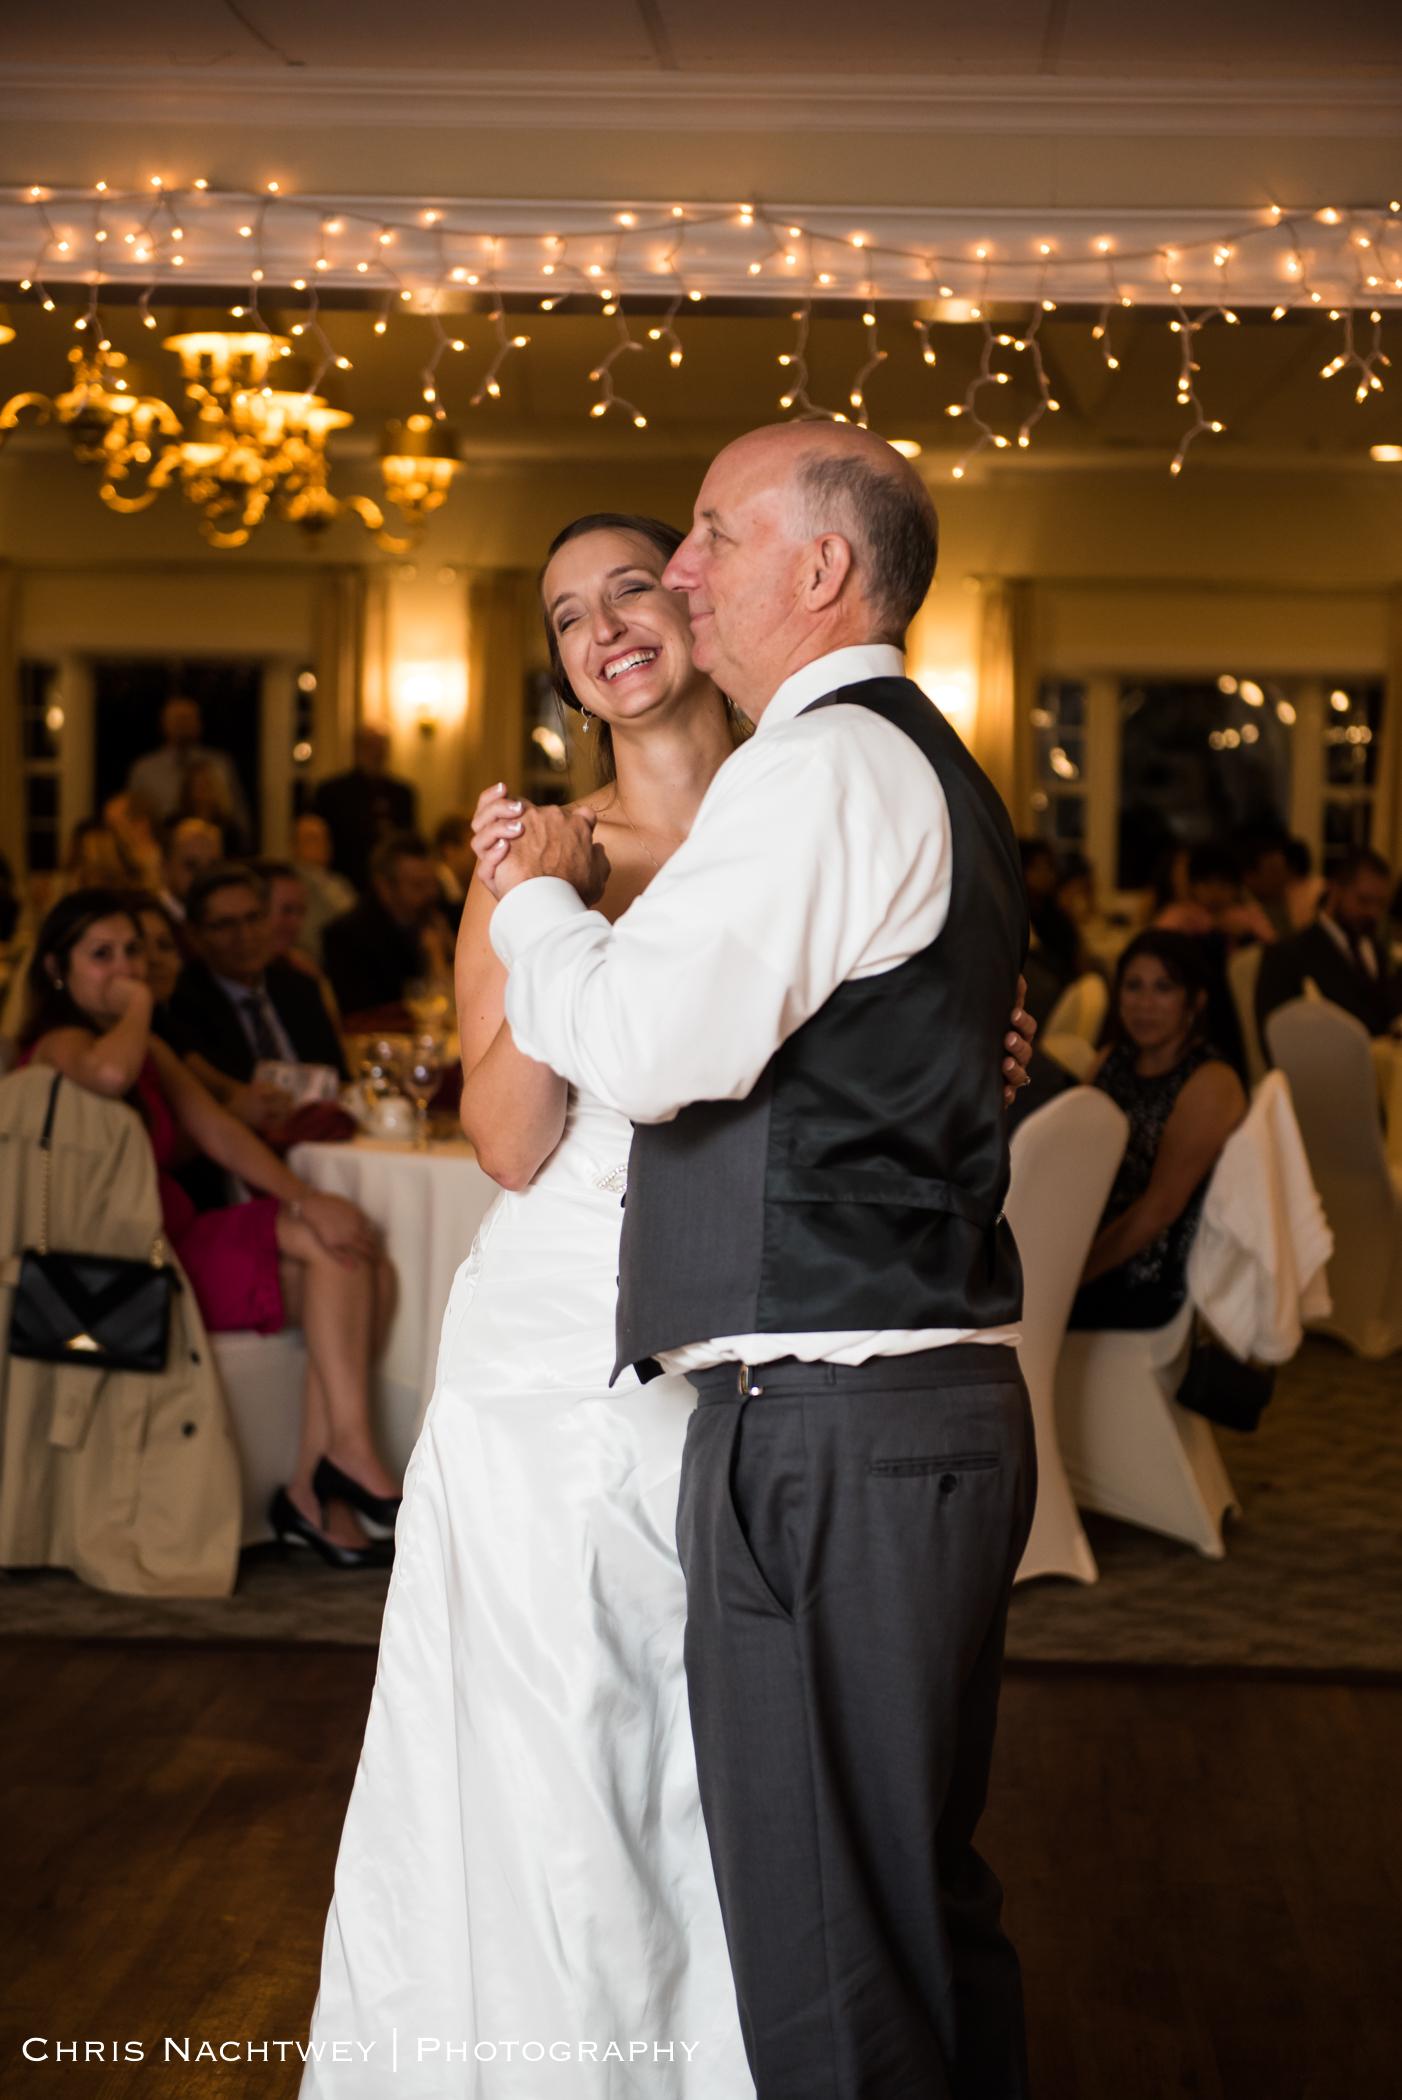 connecticut-same-sex-wedding-photographers-chris-nachtwey-2018-lisa-karina-34.jpg